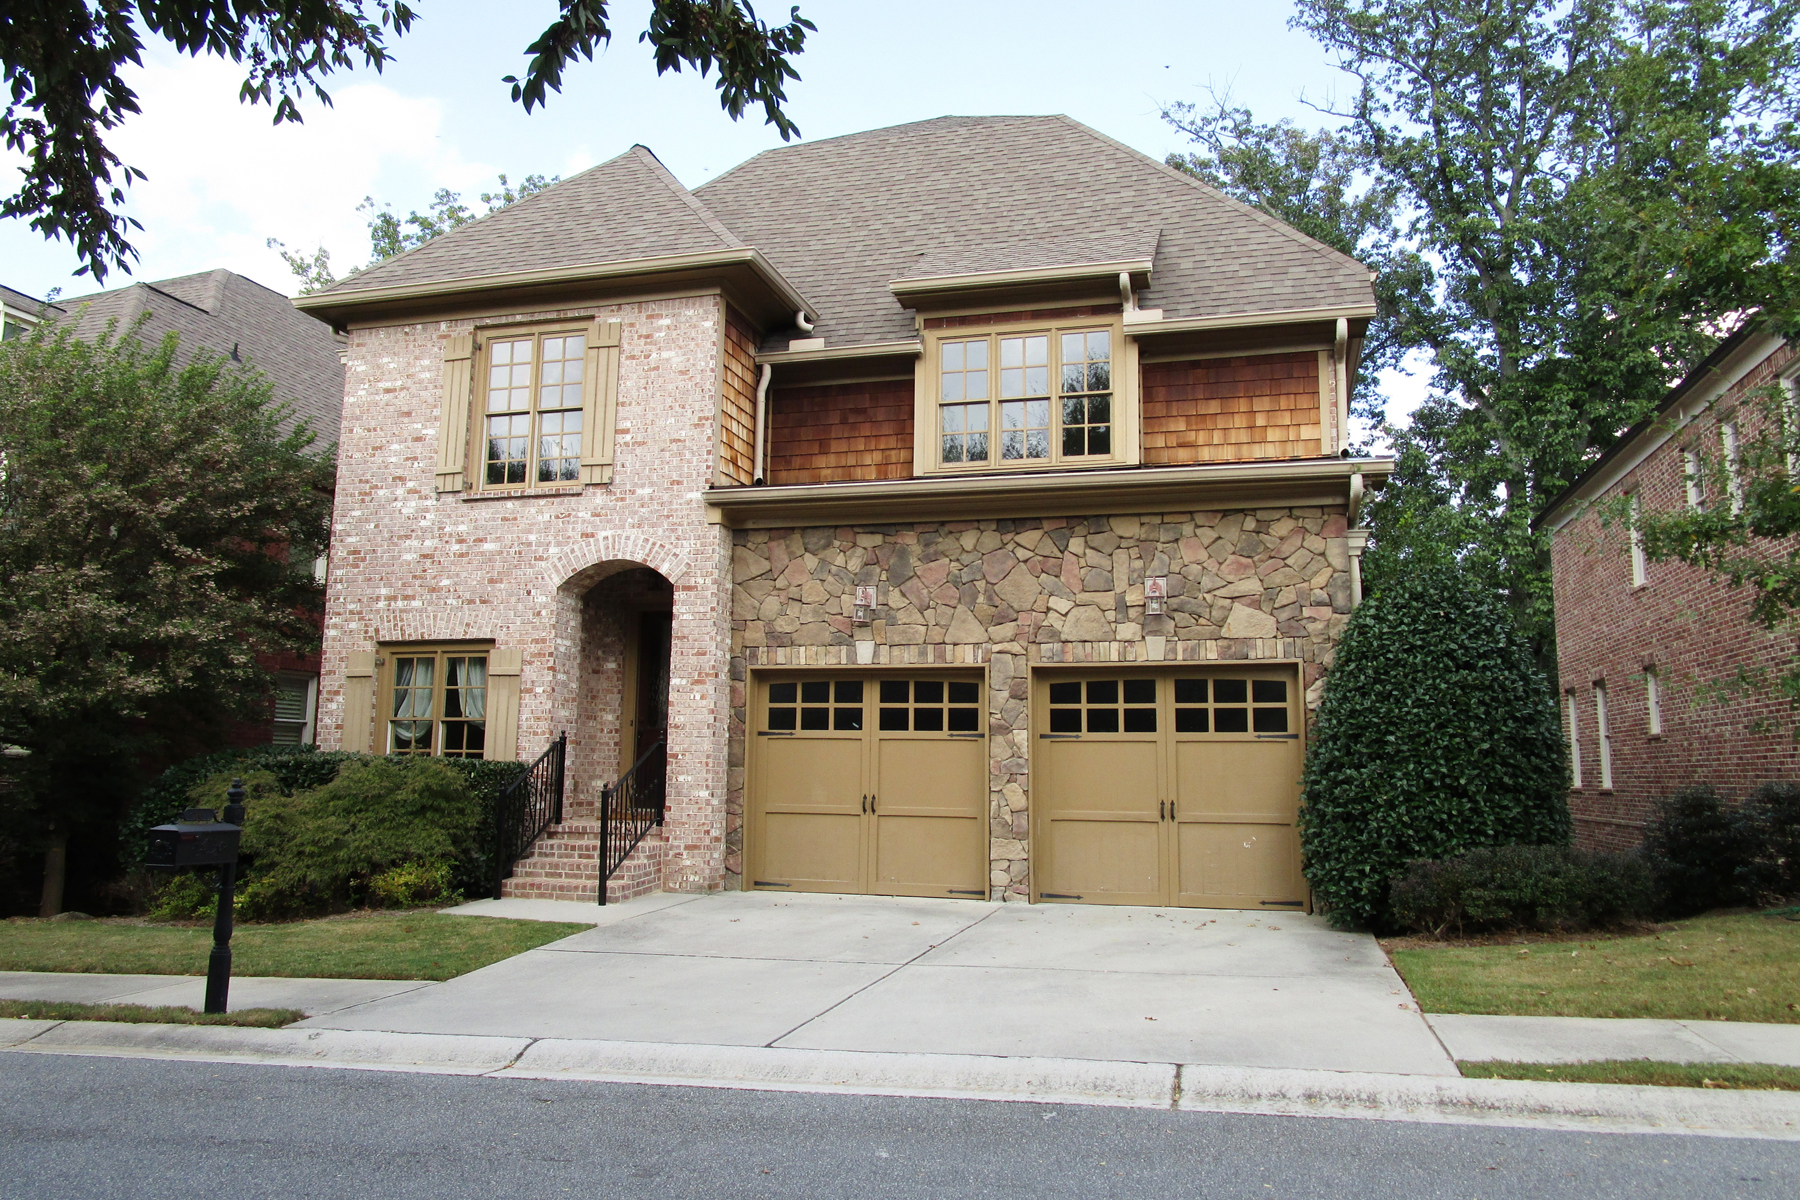 واحد منزل الأسرة للـ Rent في Spacious, Private Home Available For Six Months Up To Two Years 26 High Top Circle, Sandy Springs, Georgia, 30328 United States